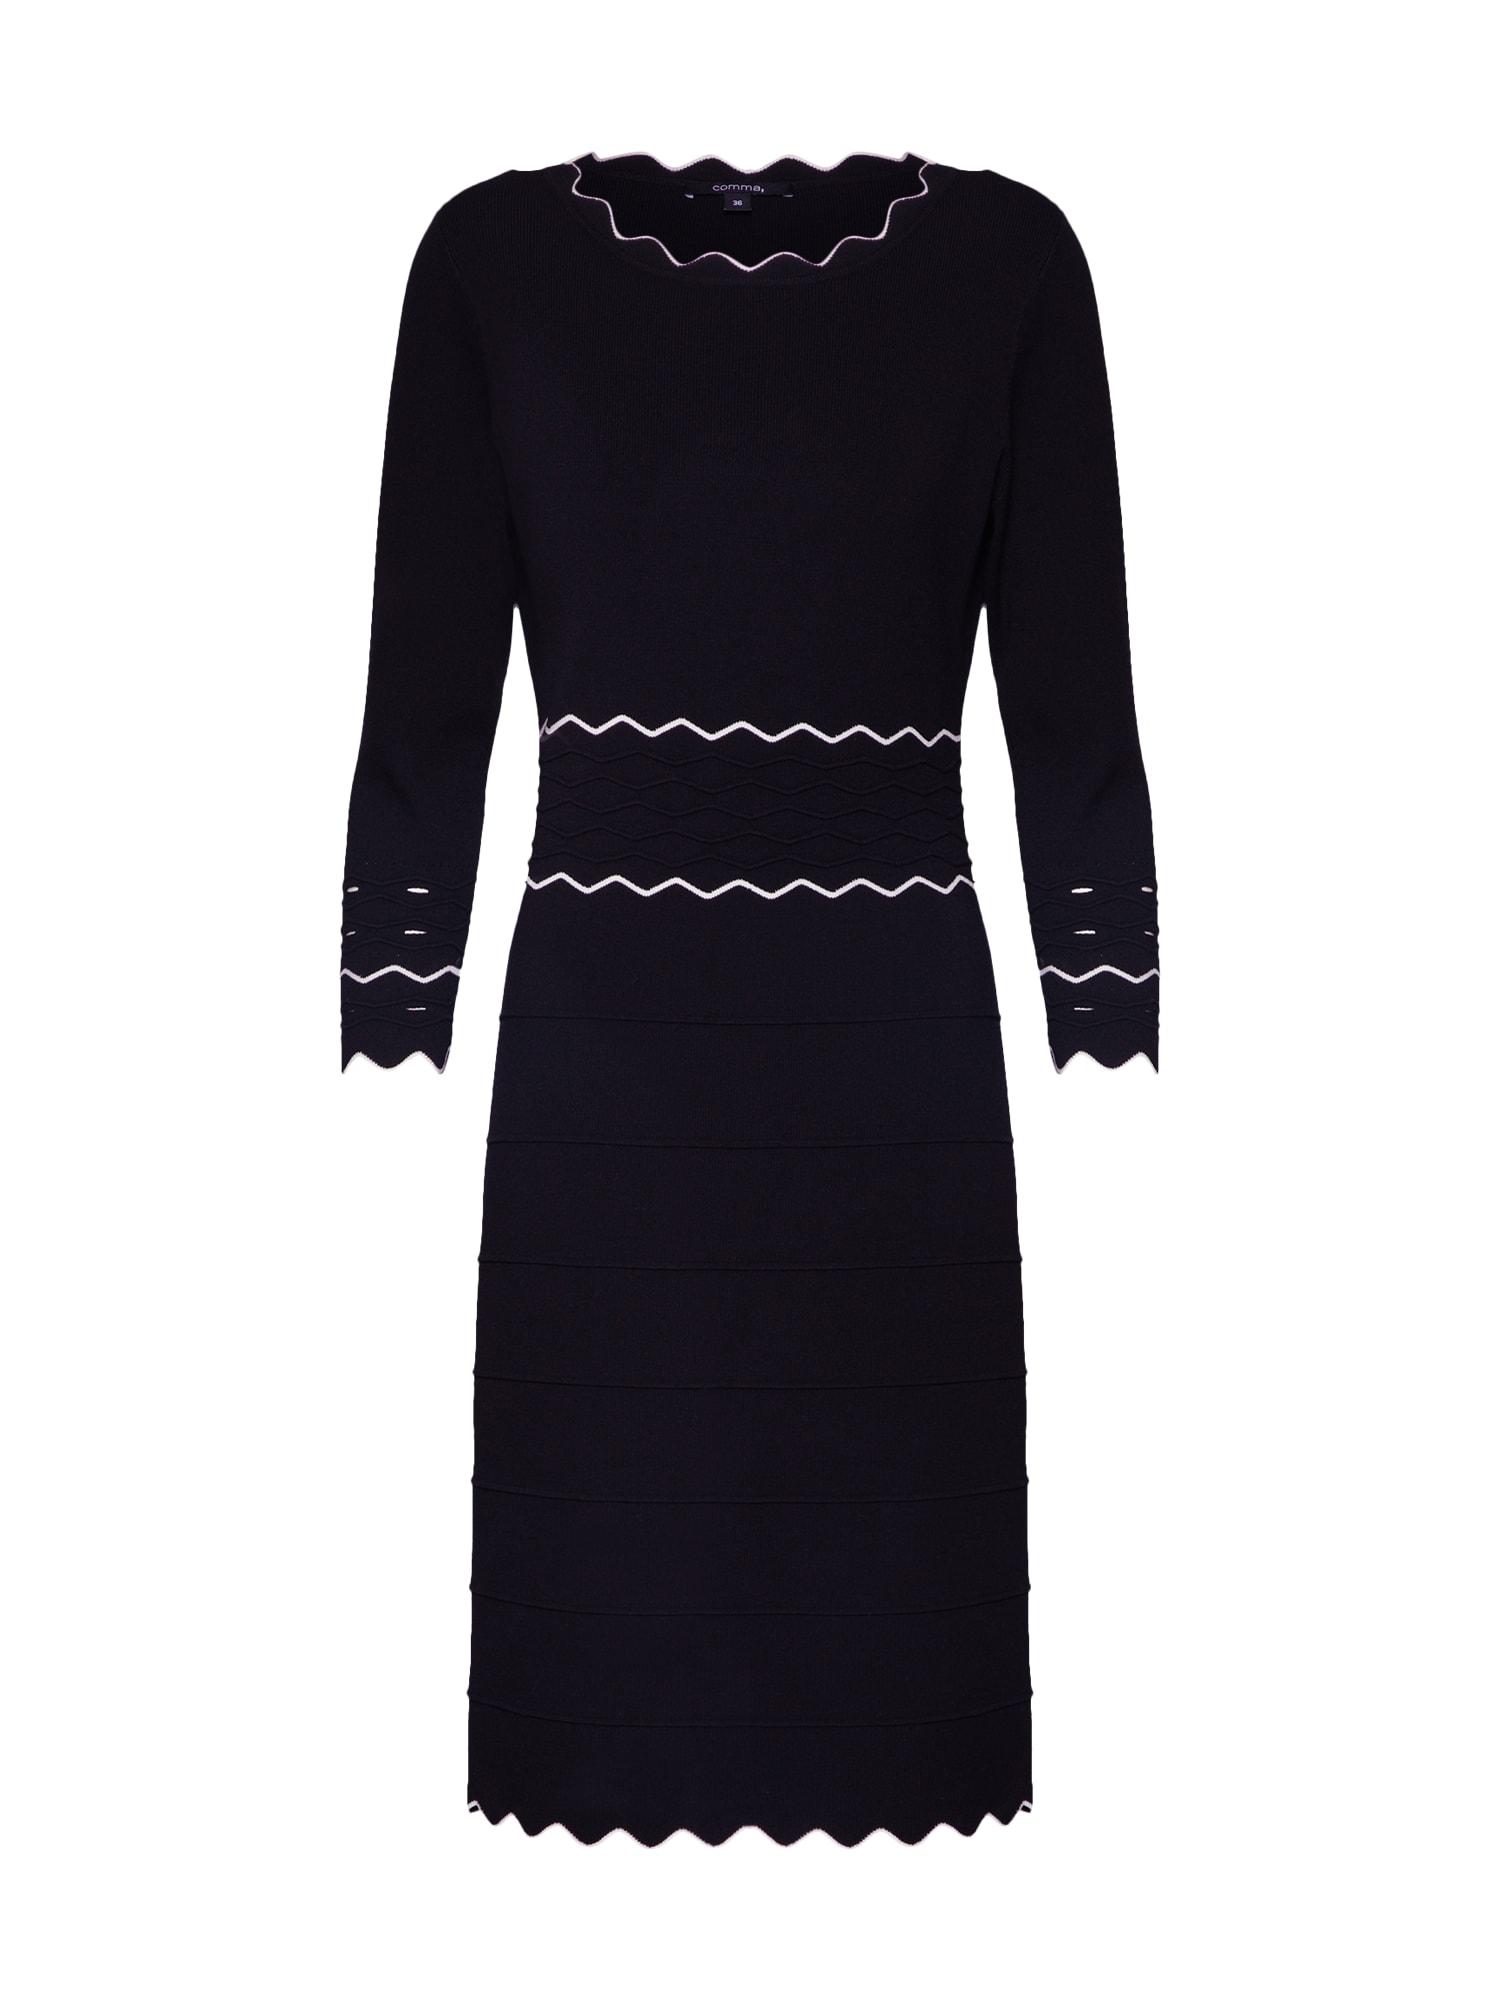 COMMA Kleid schwarz - Schwarzes Kleid